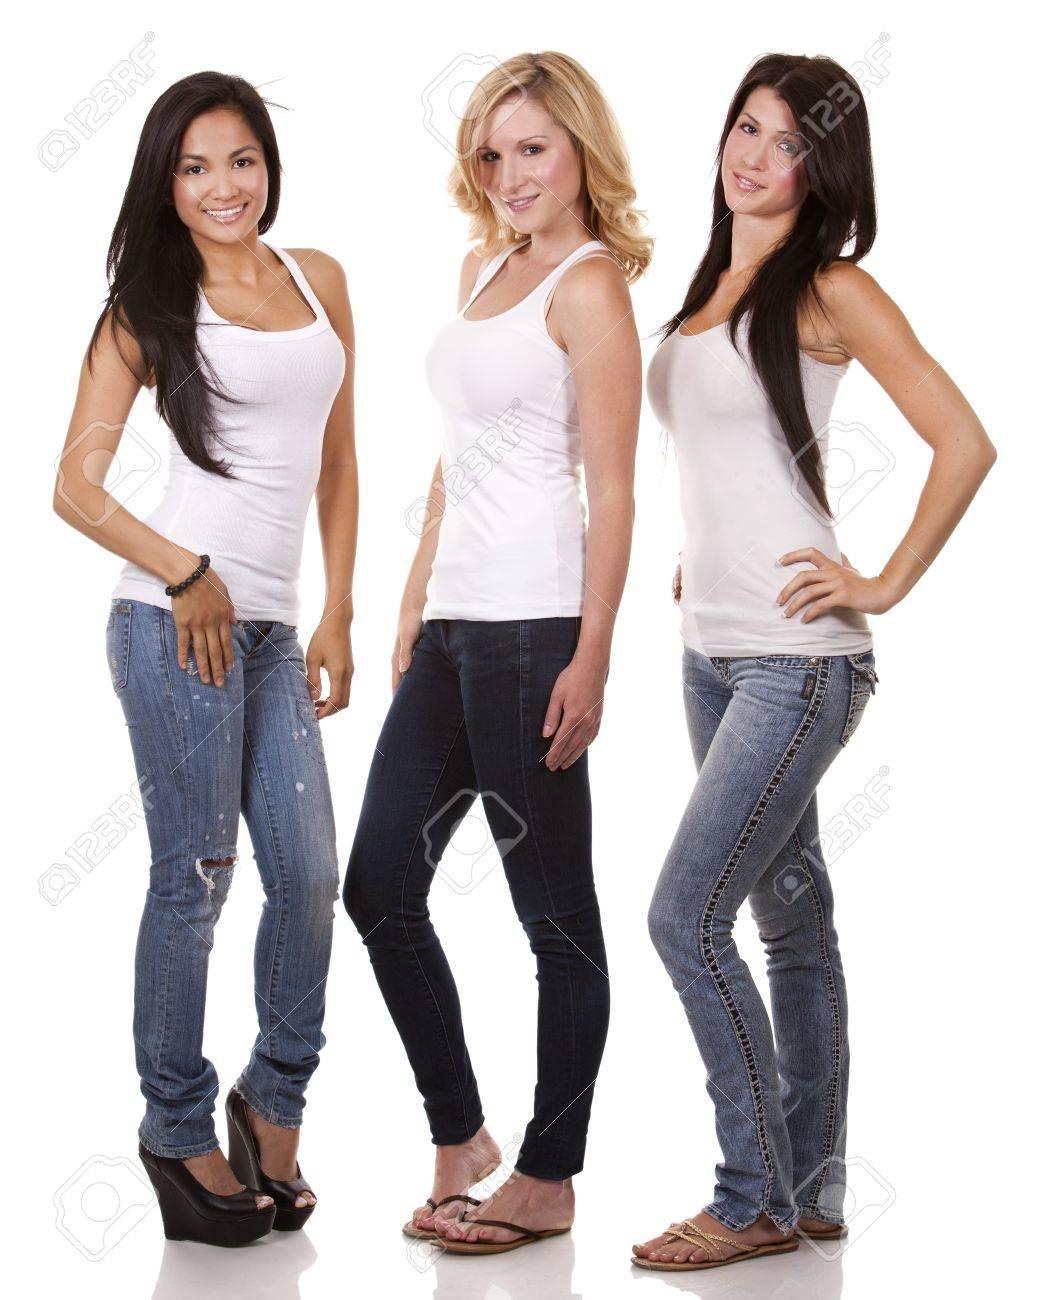 beautiful three women having fun on white background - 21861851